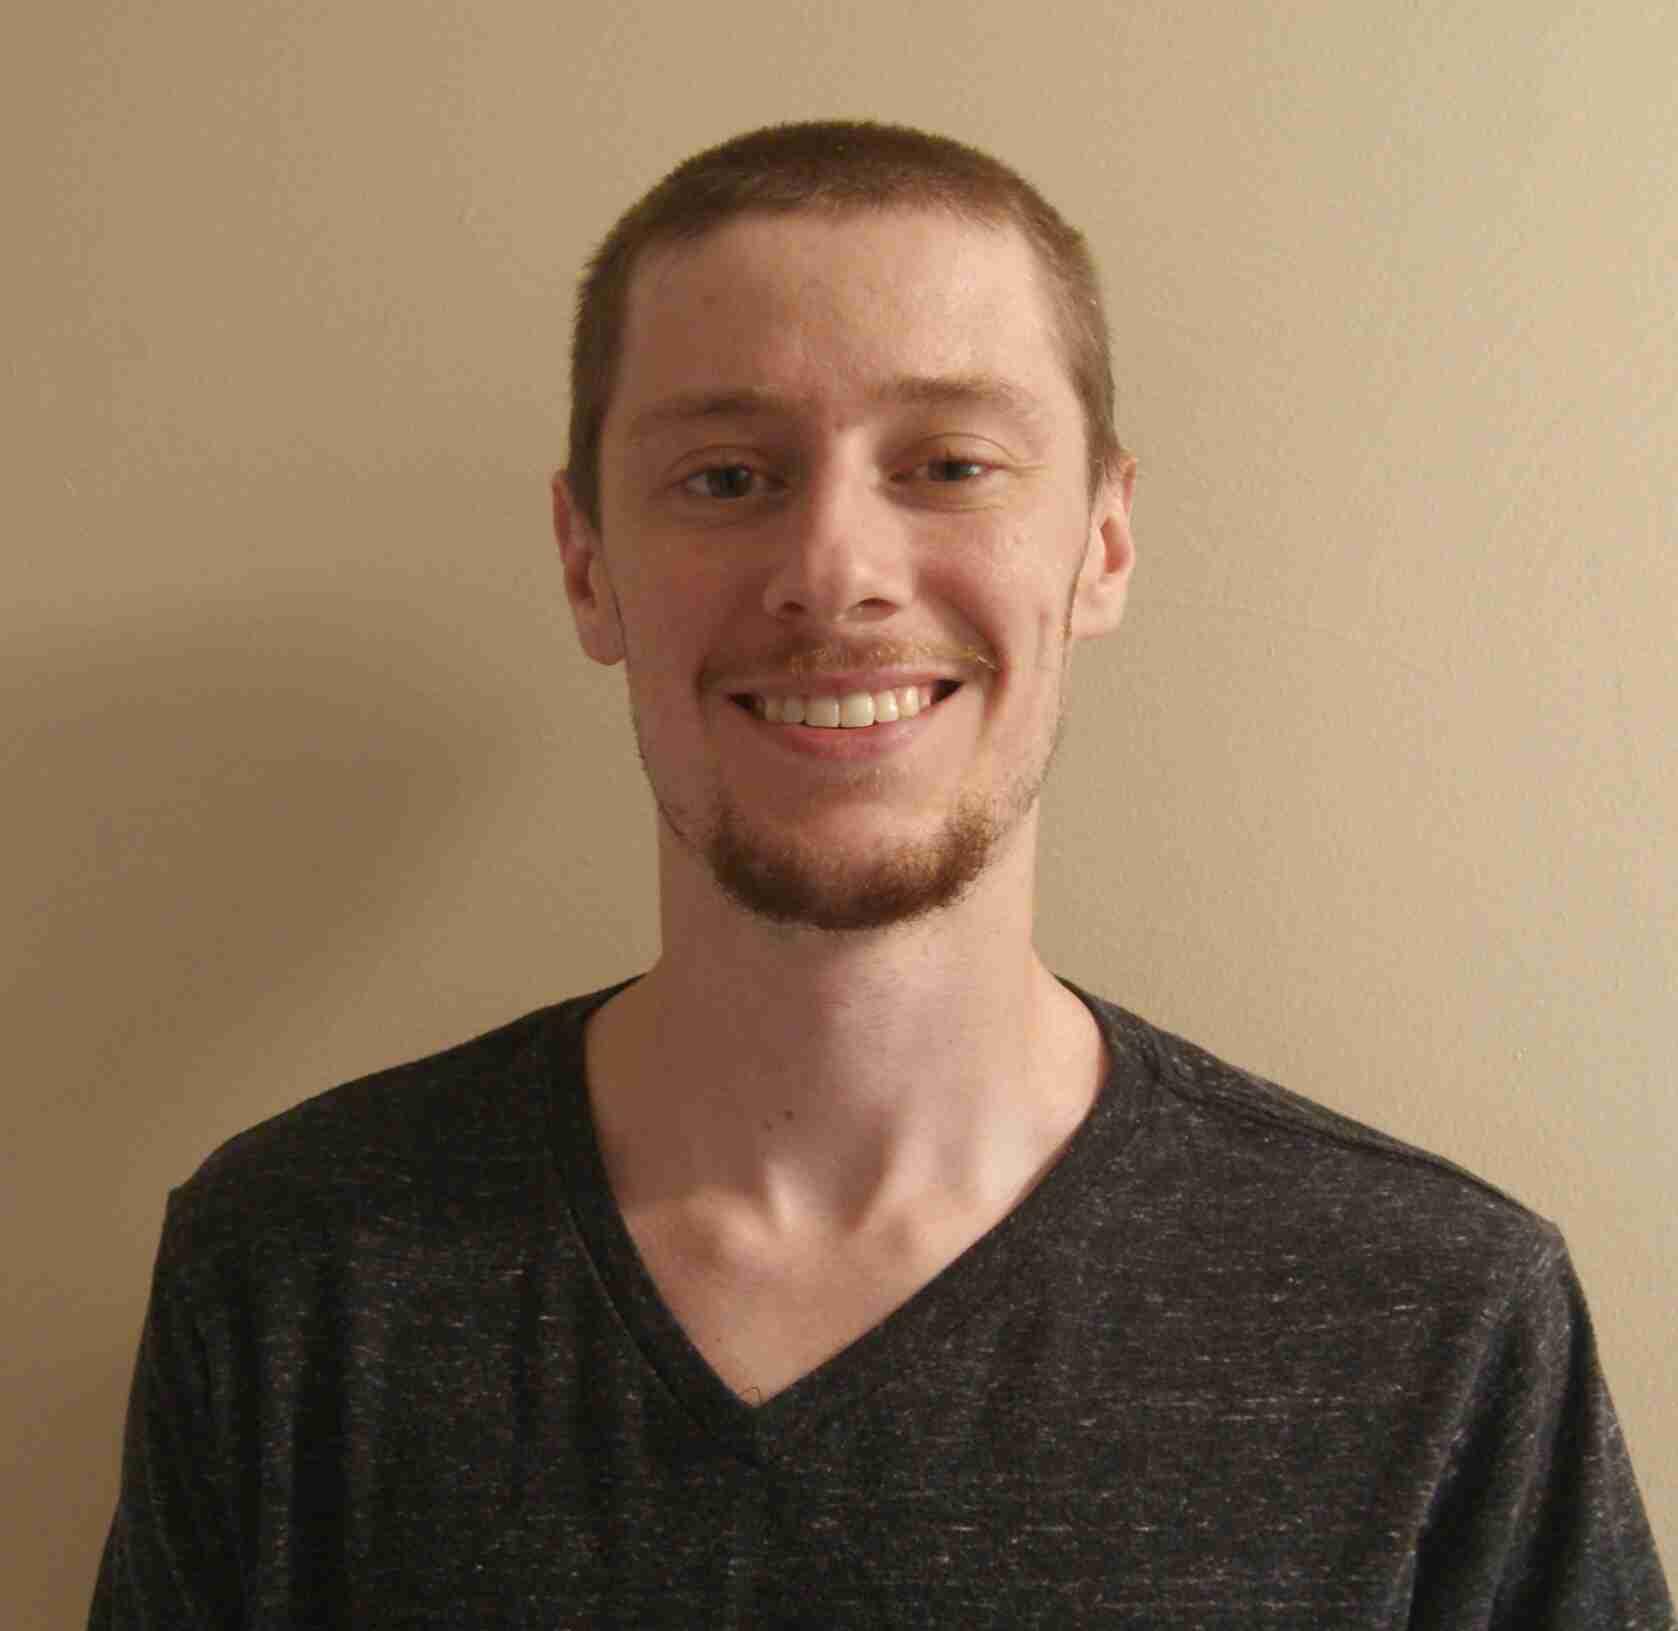 Josh McIntyre